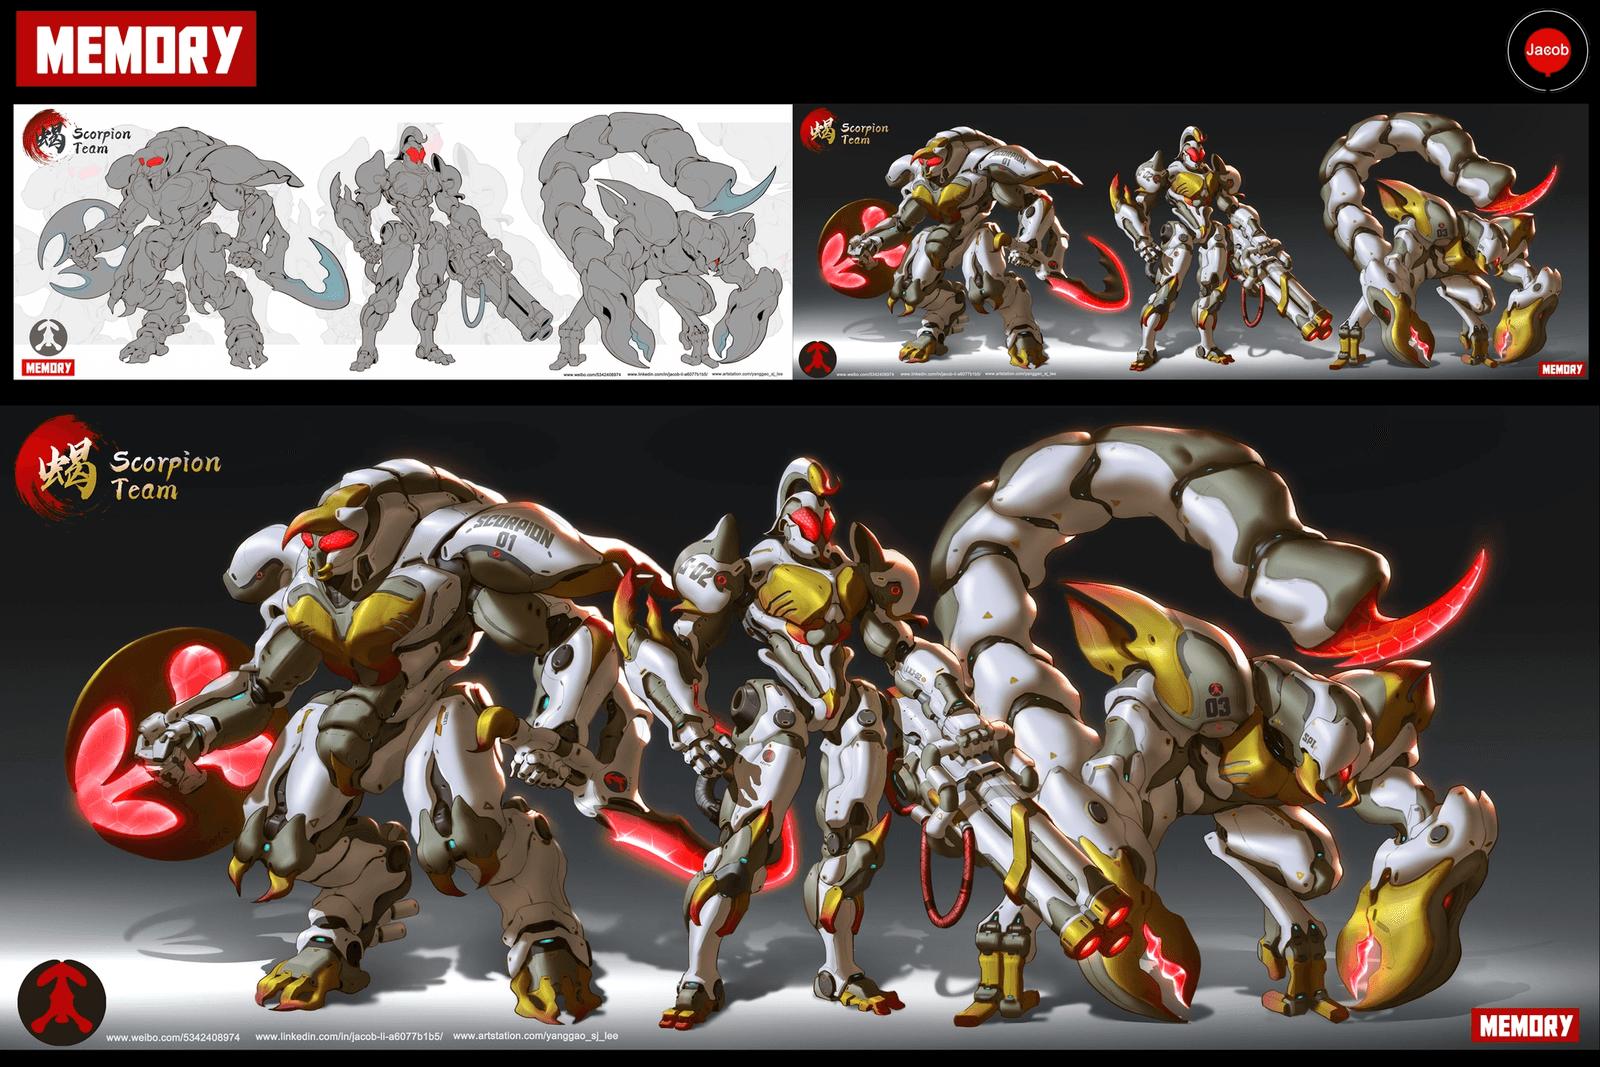 Memory: Scorpion Team